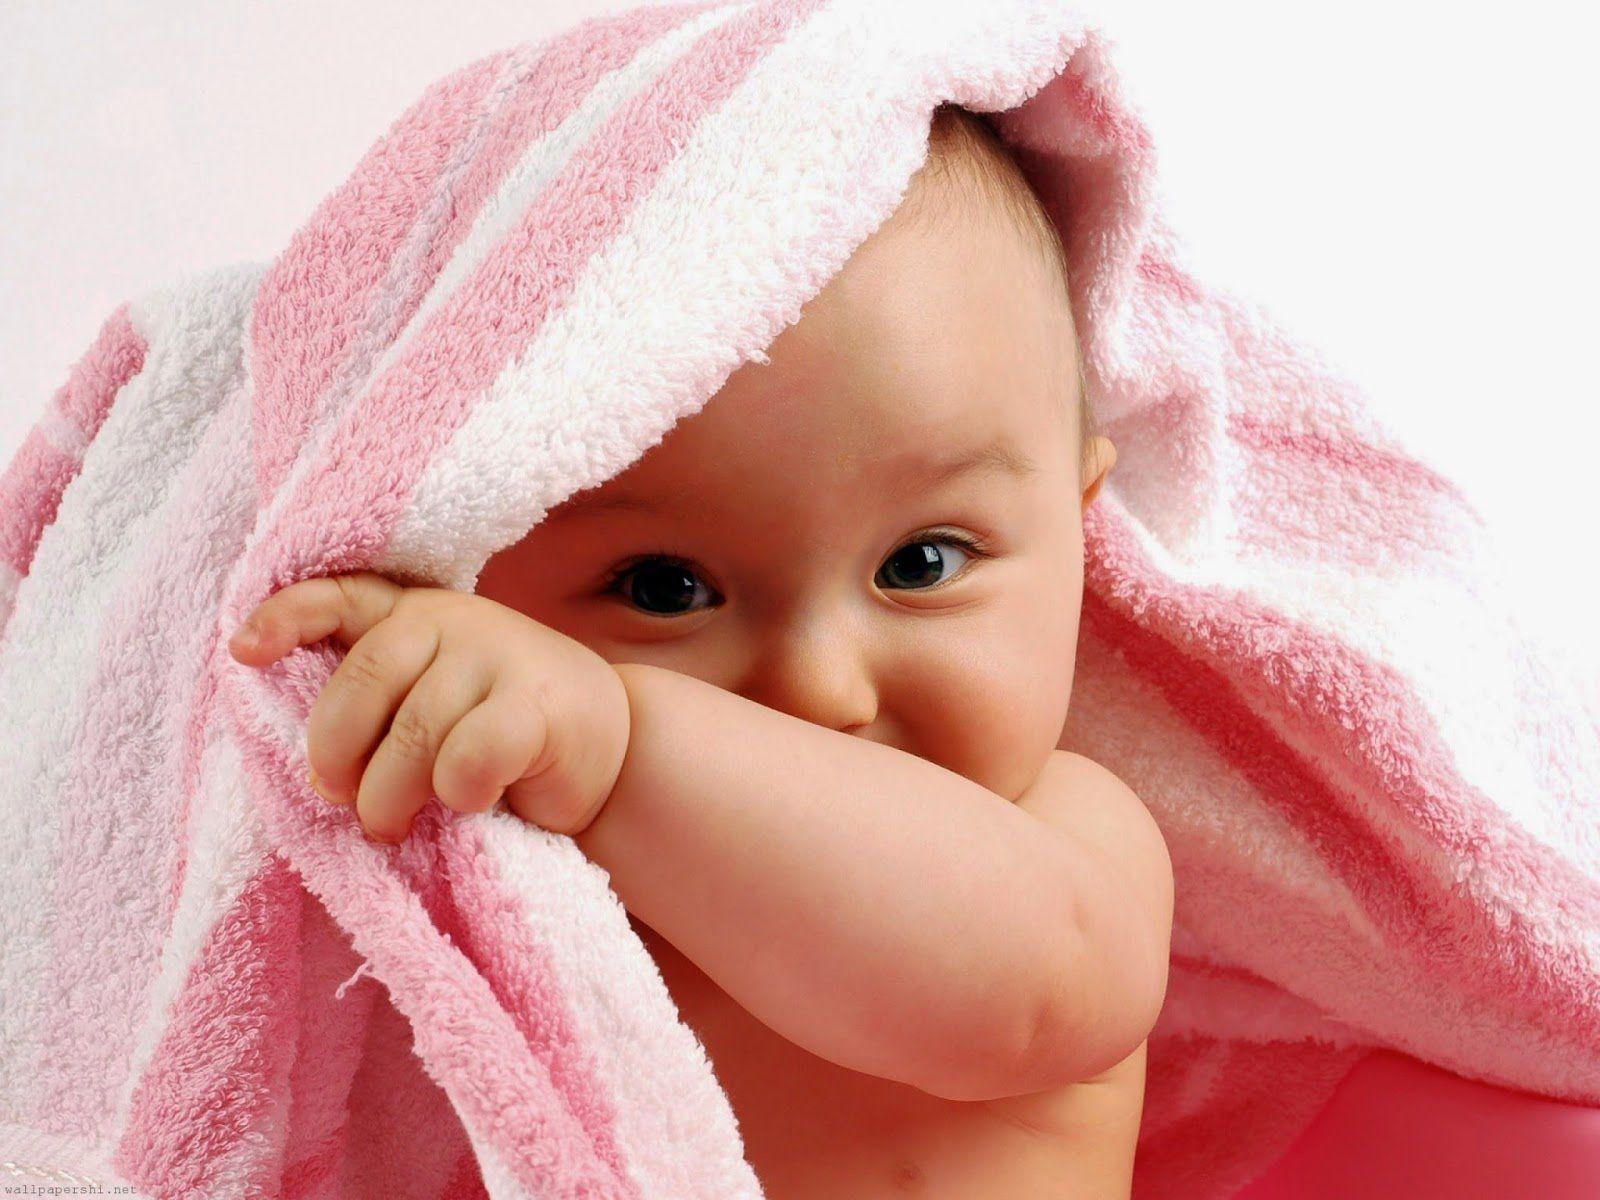 Bayi Lucu Imut Gemesin Ngomong I Love You Bayi Lucu Lucu